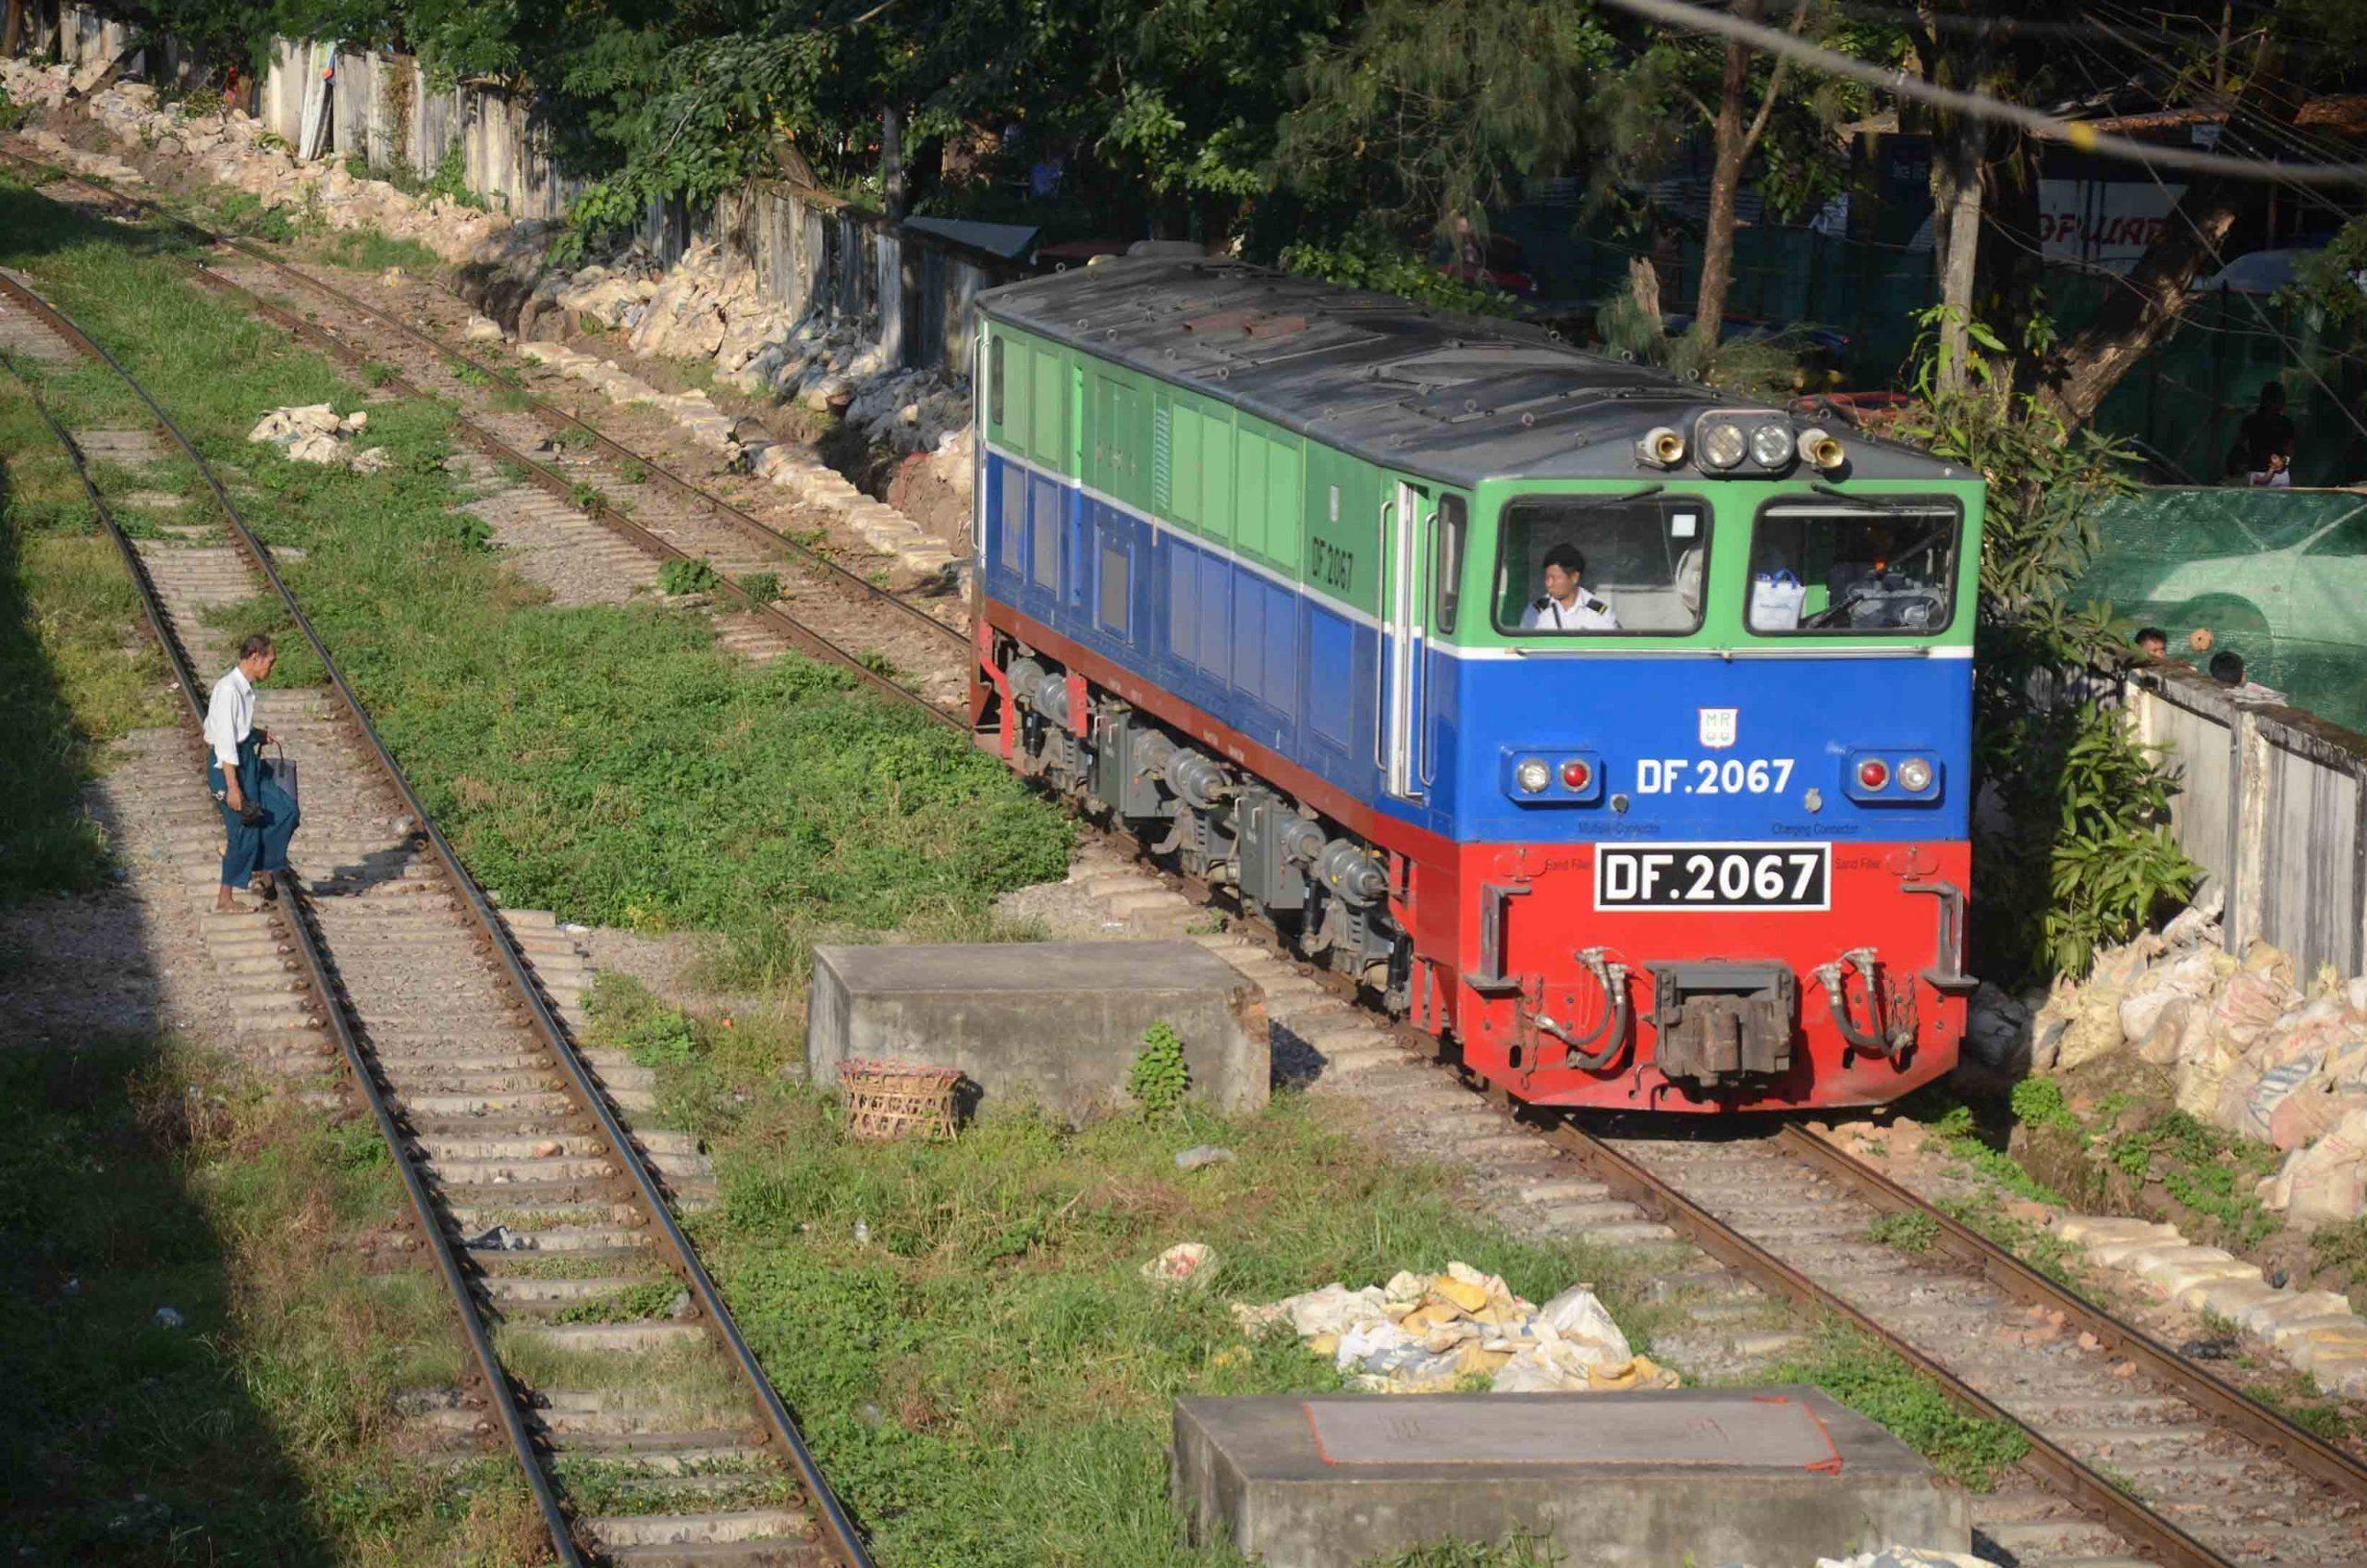 DSC 8795 72 scaled